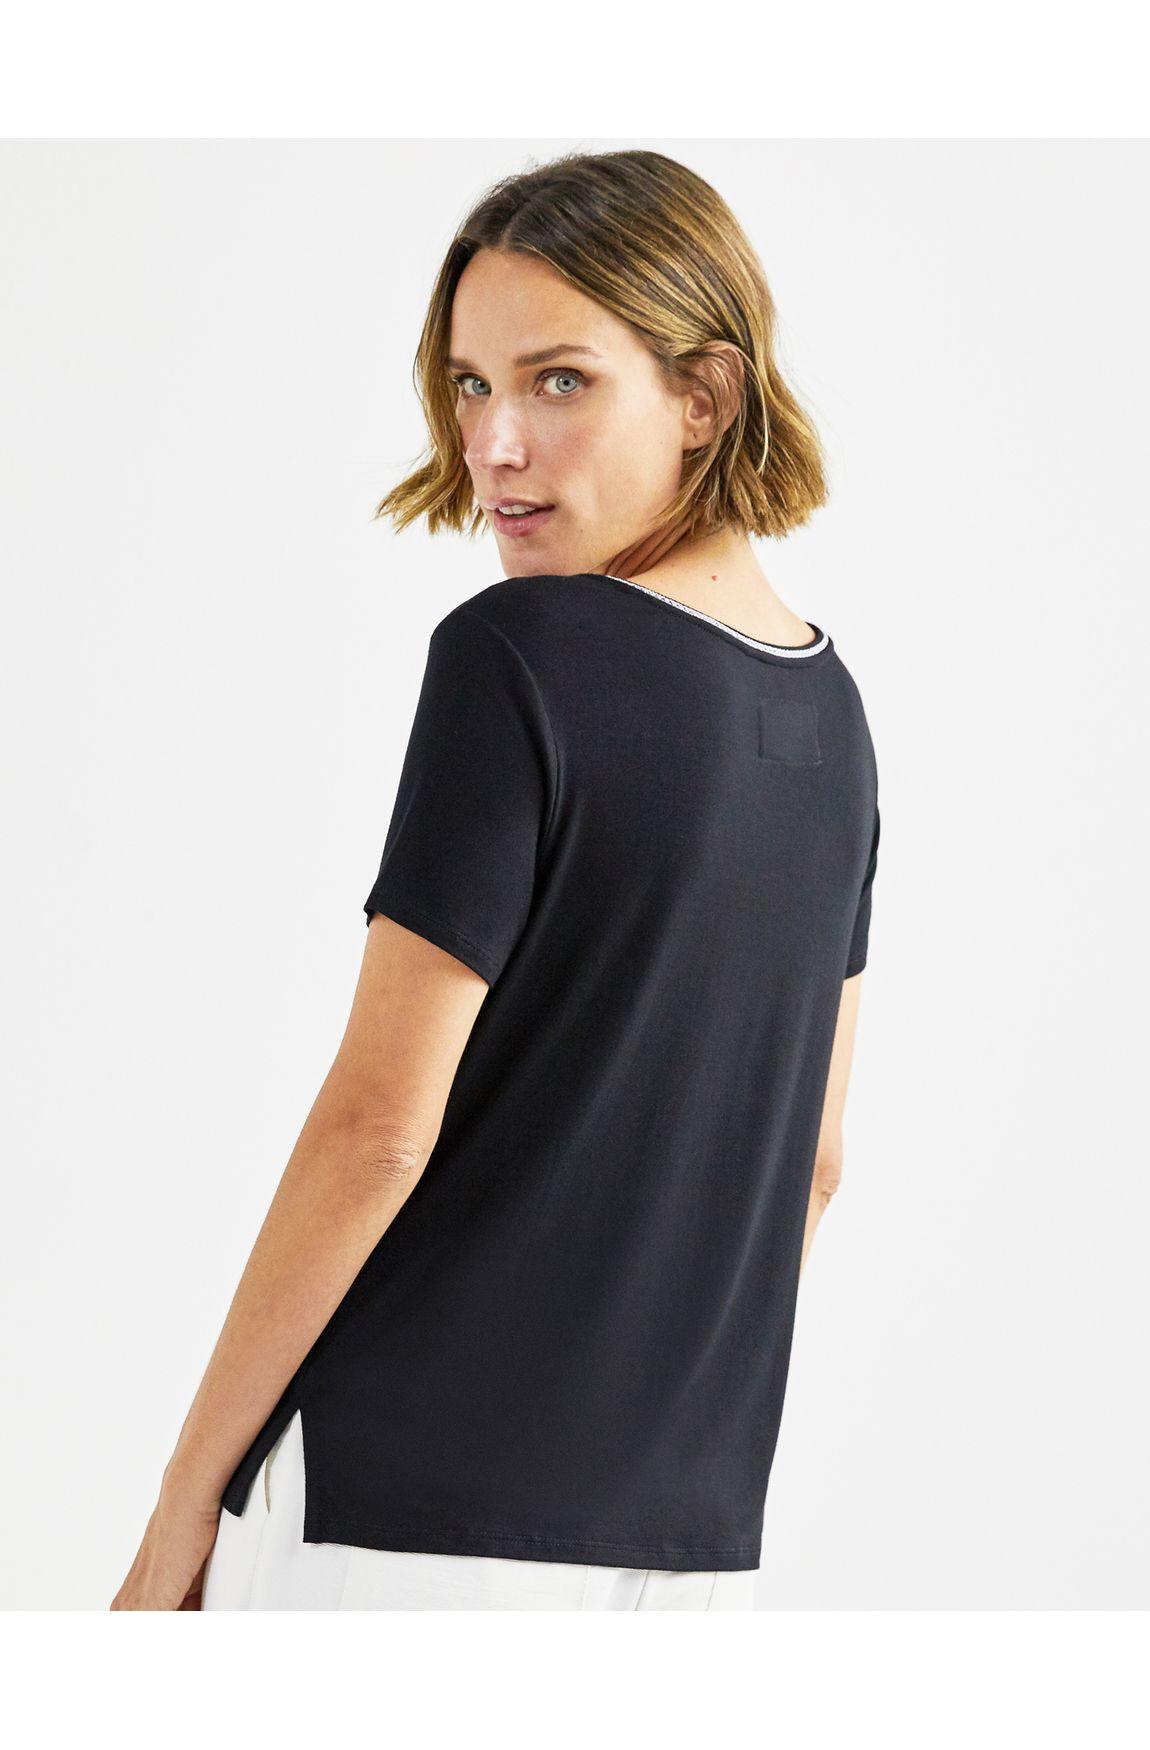 T-shirt cadarco gola